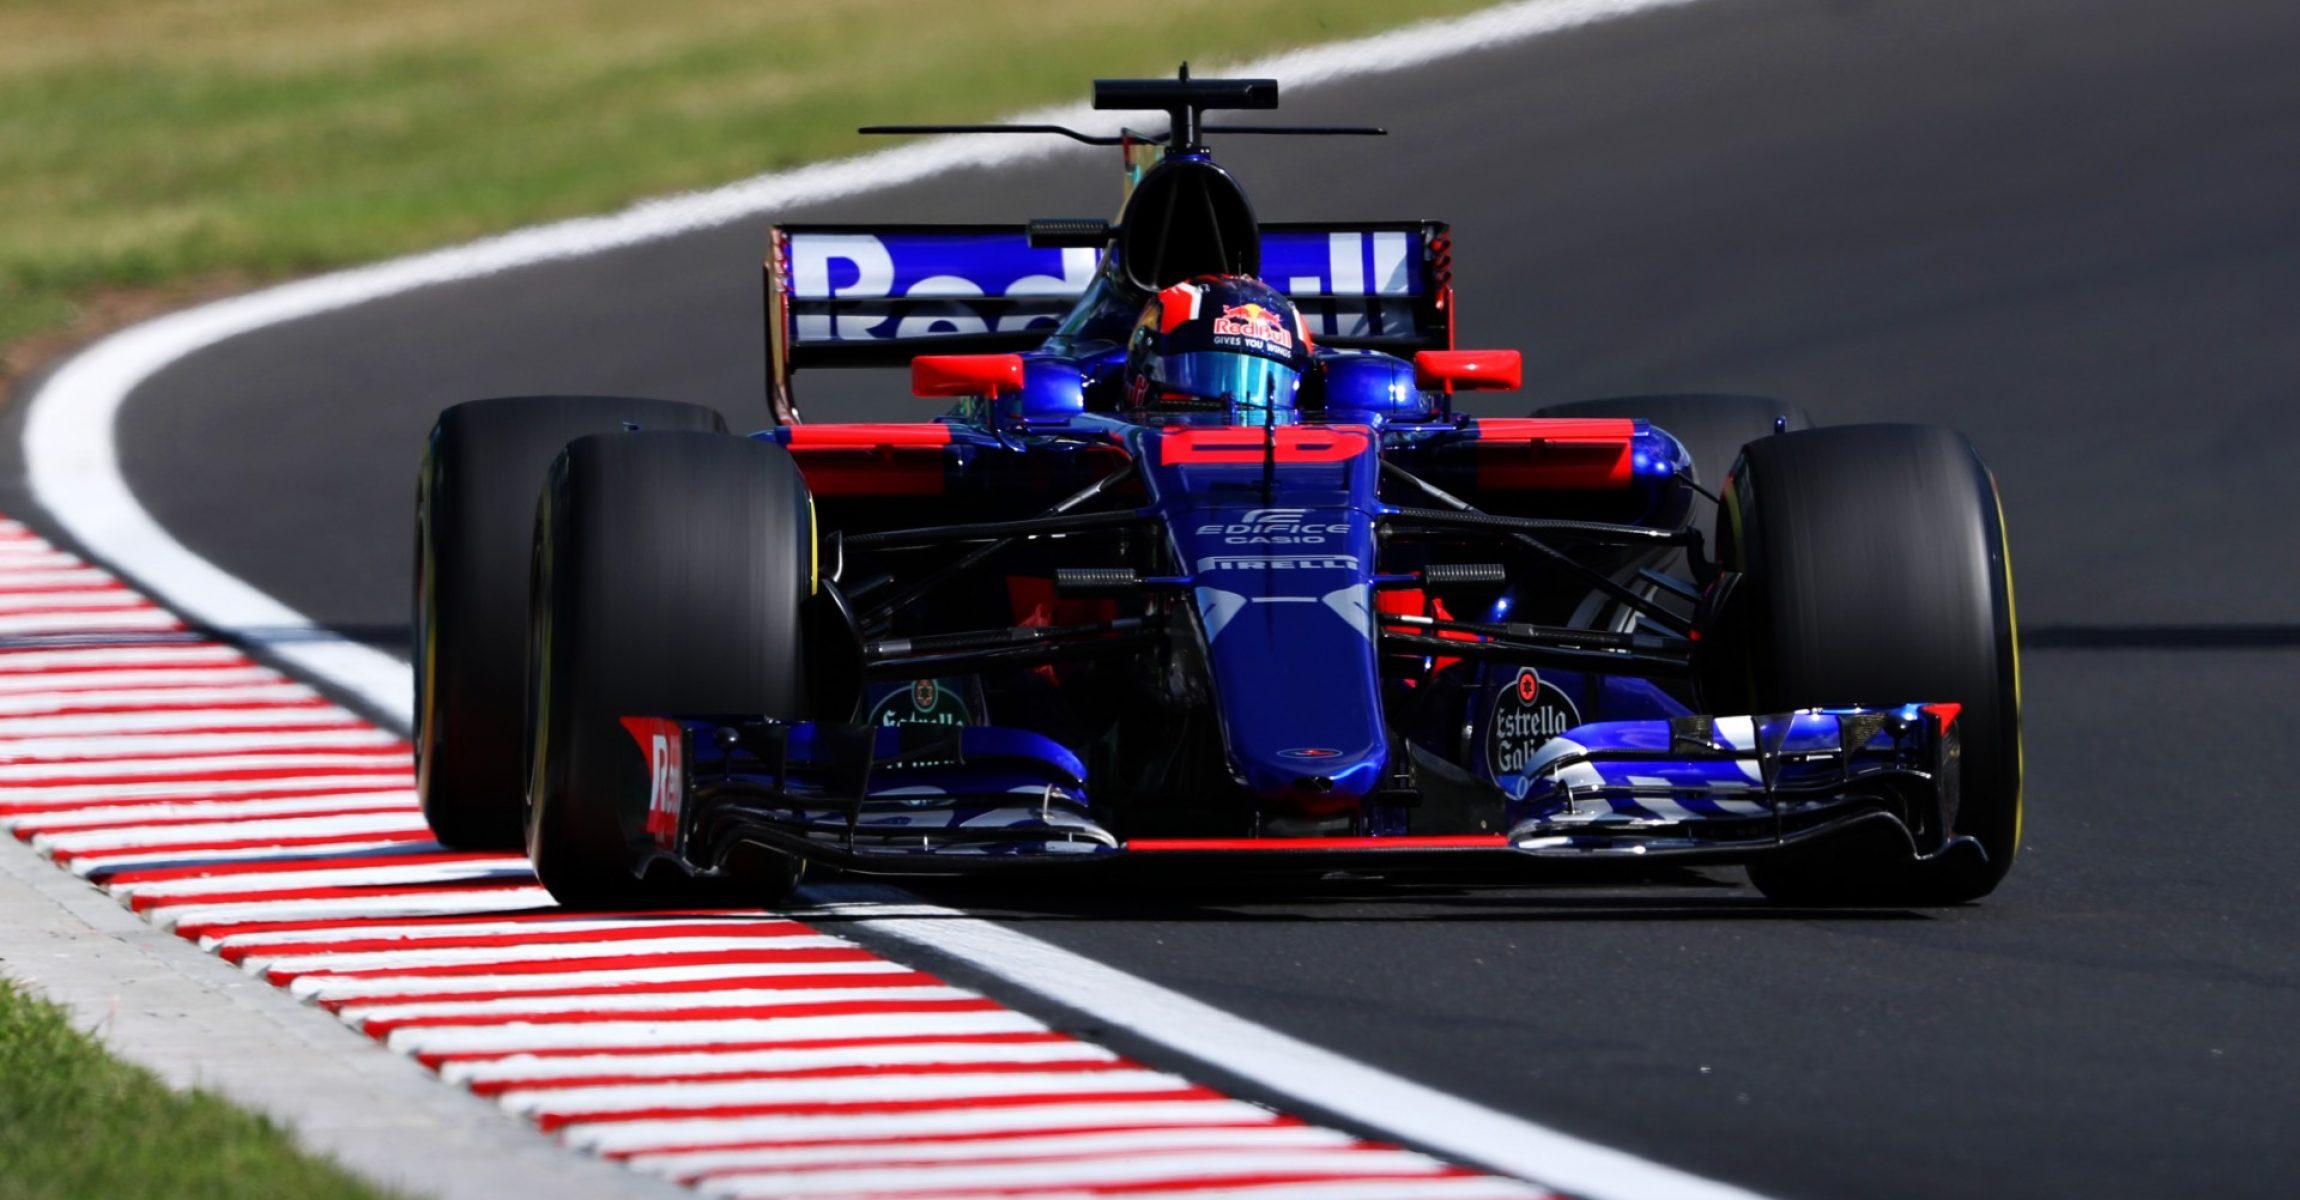 F1 Grand Prix of Hungary - Practice